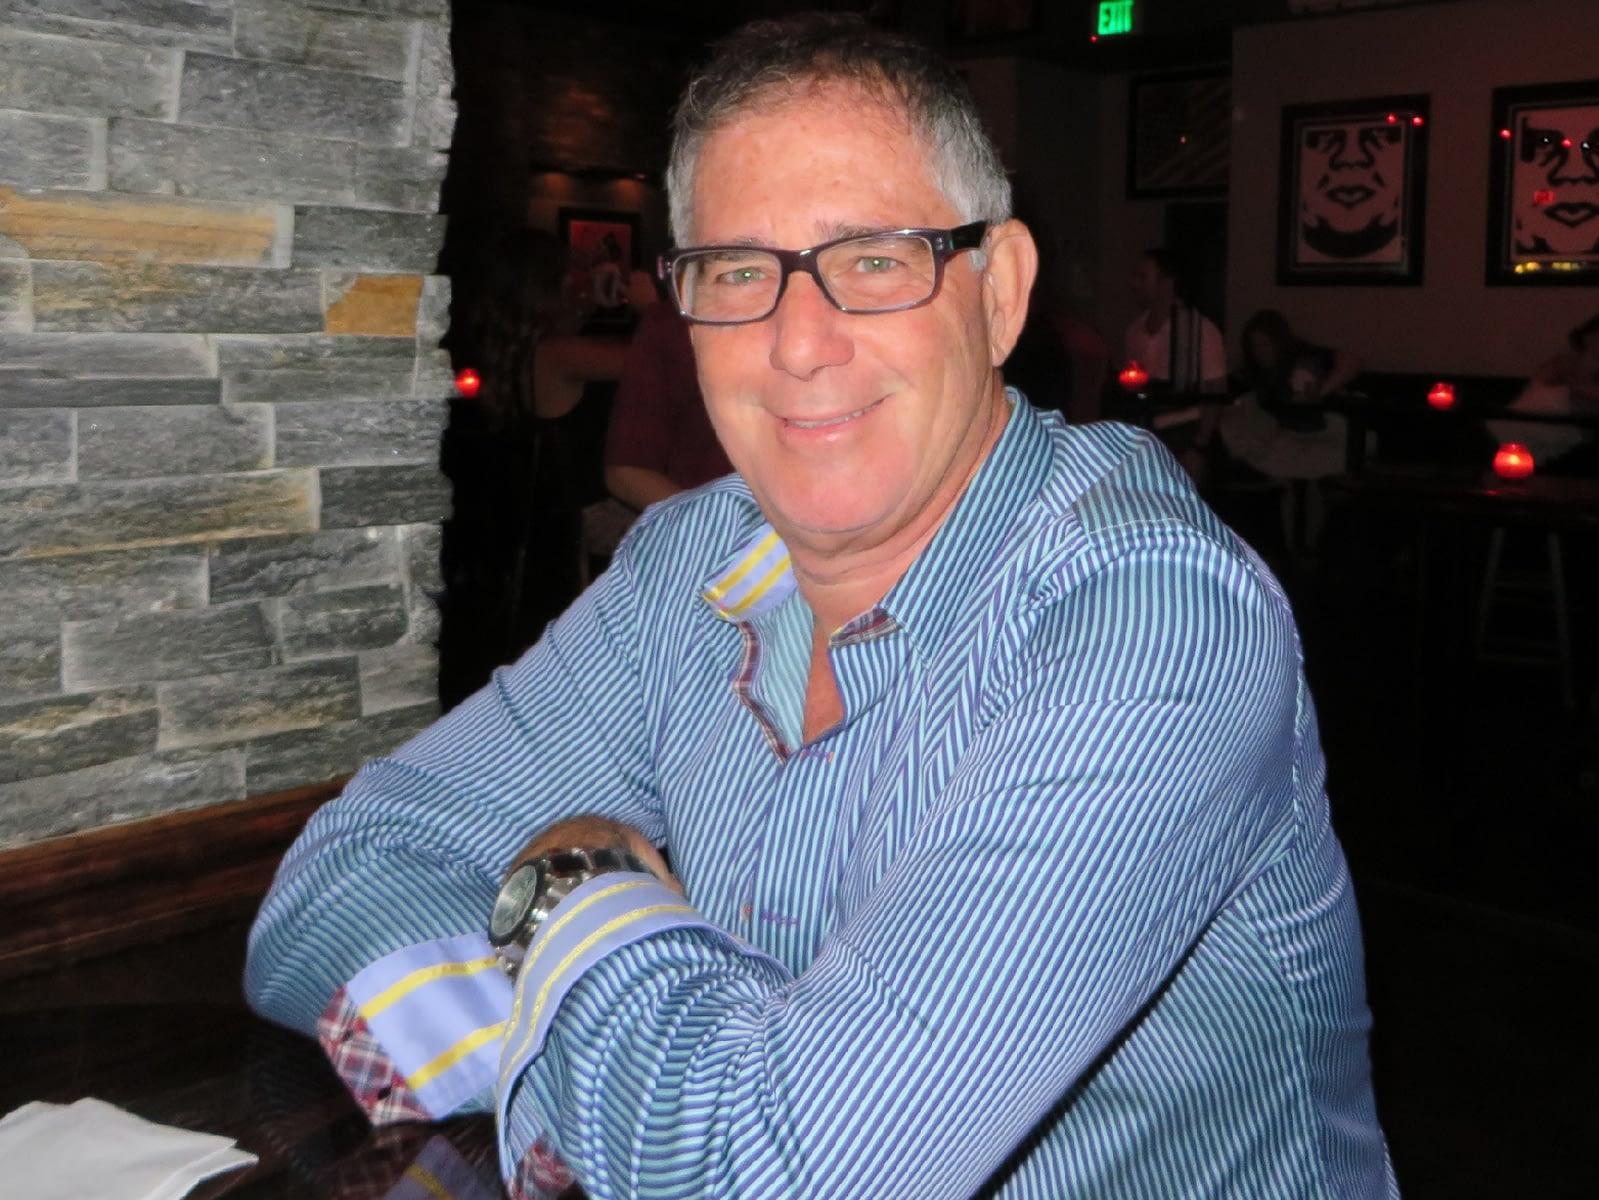 BPC Discusses the John Cushman Walk for Diabetes on WBLZ Sports Radio